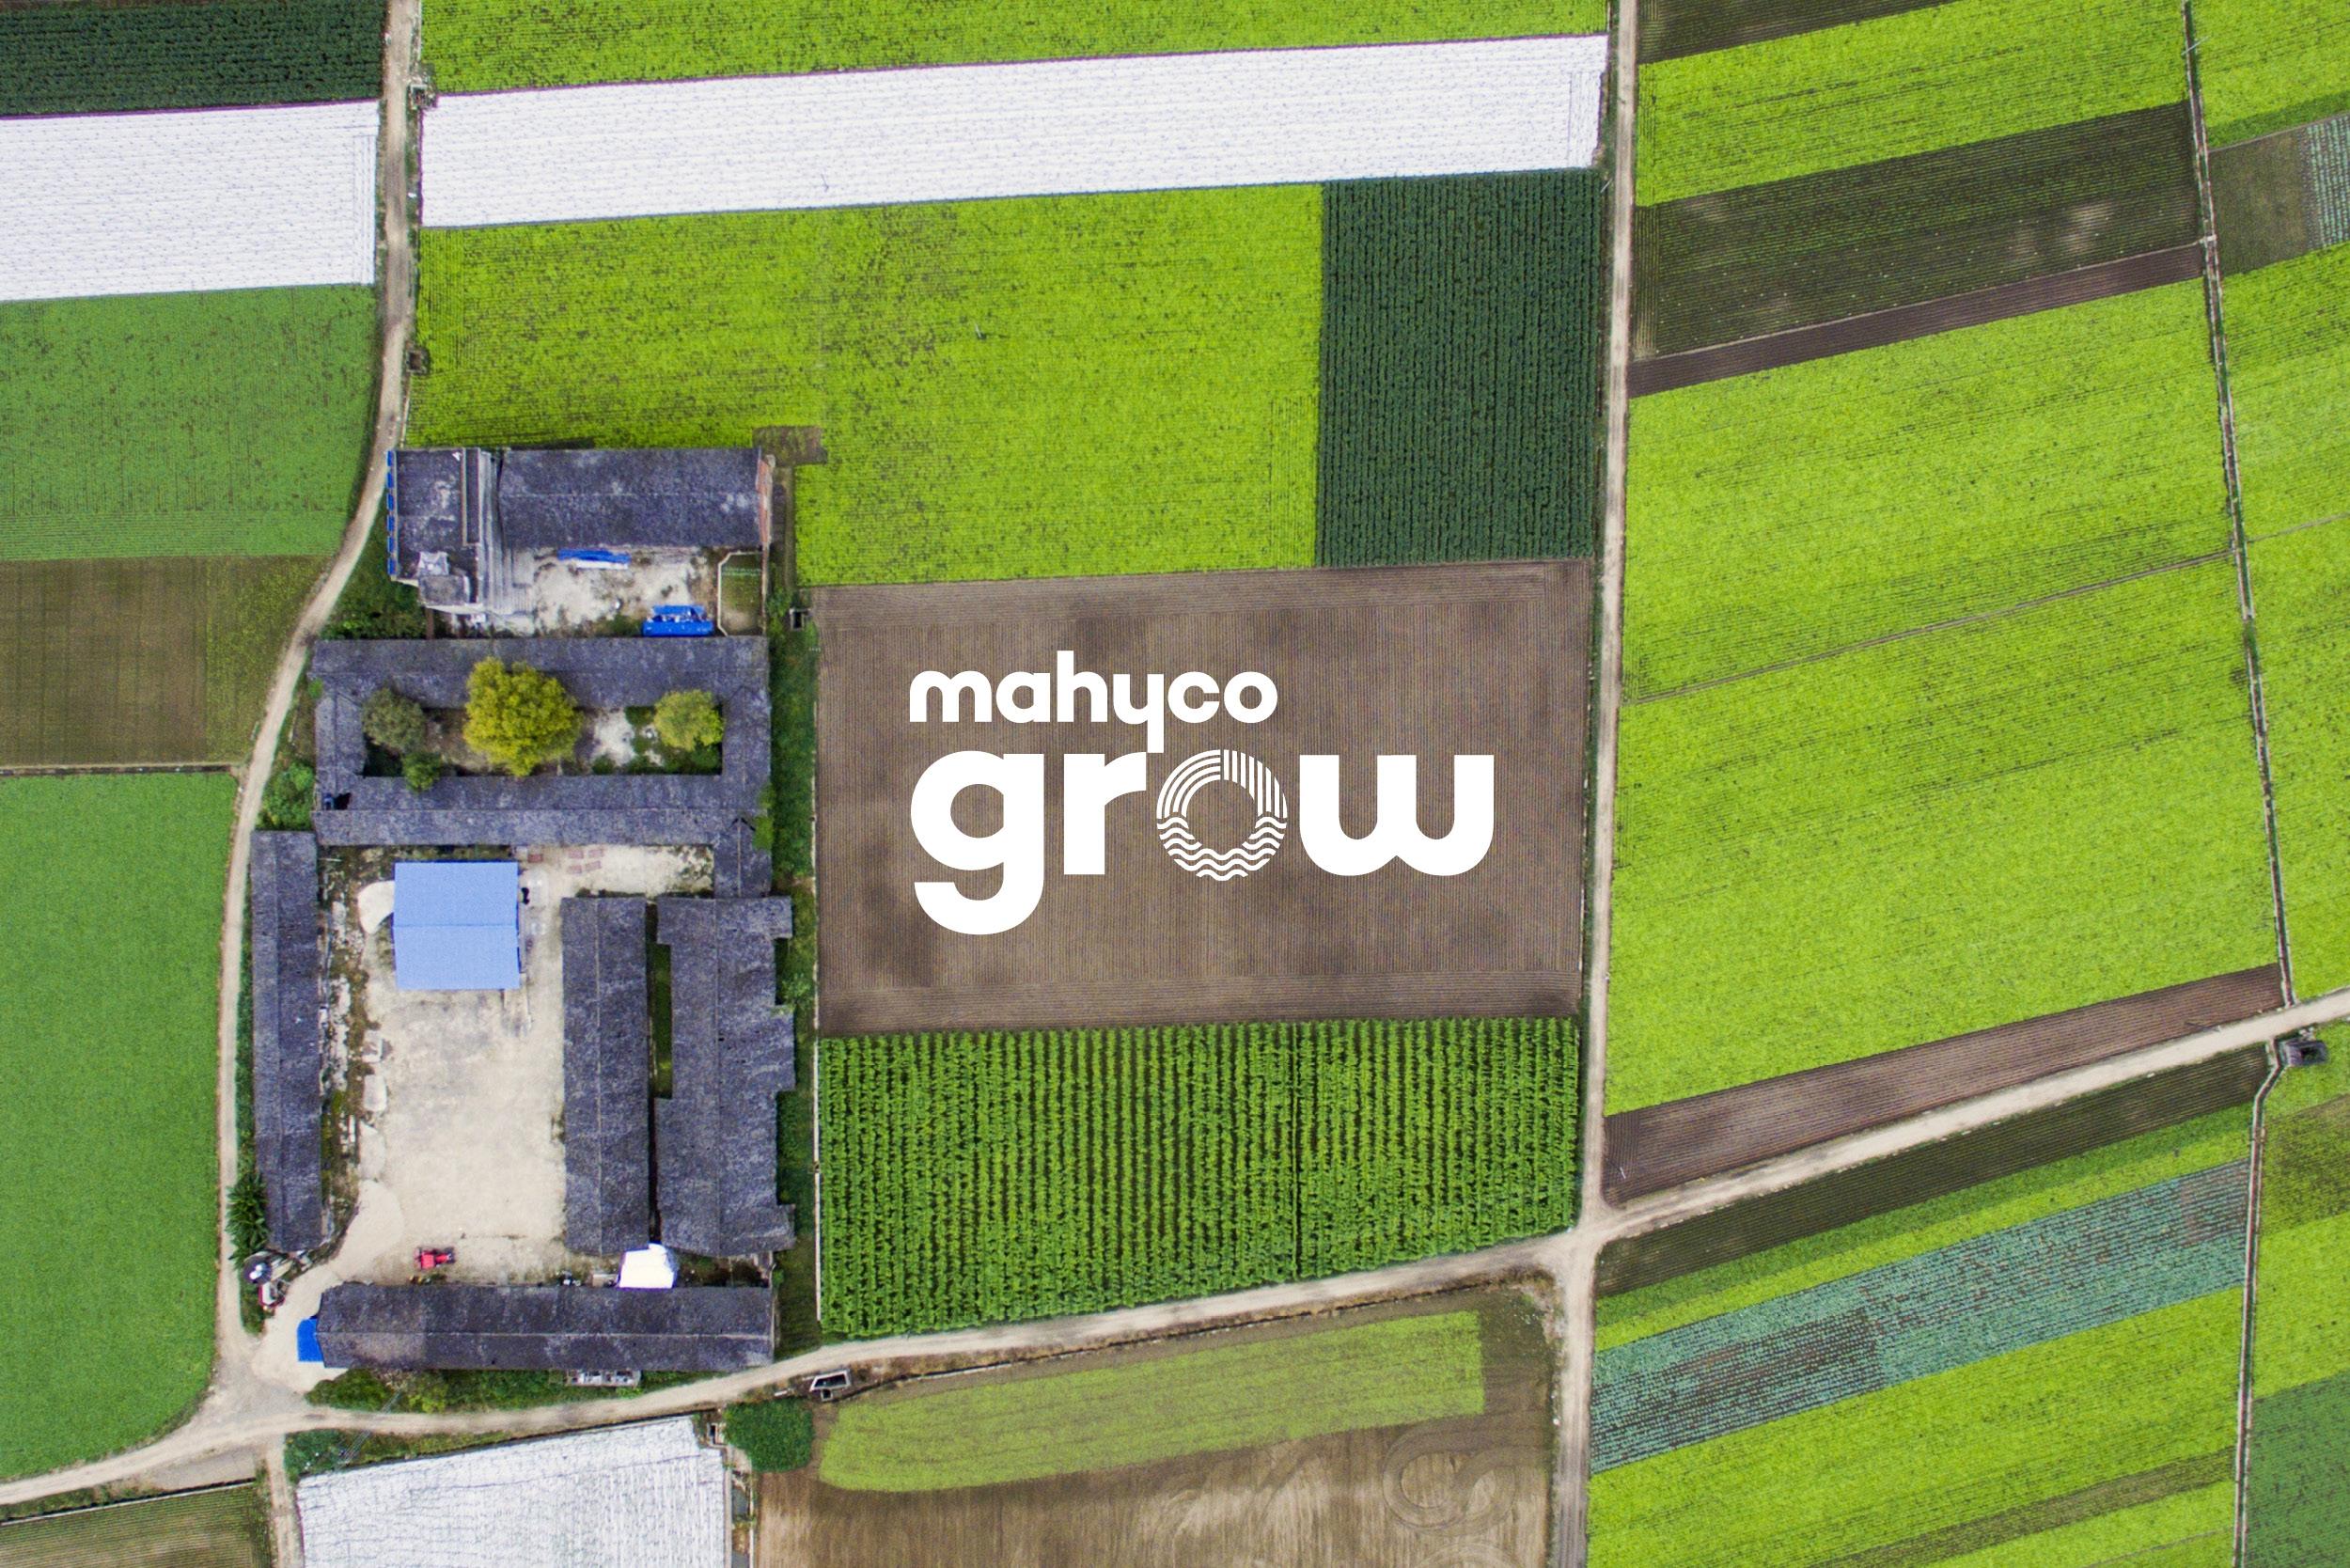 Mahyco grow template2.jpg